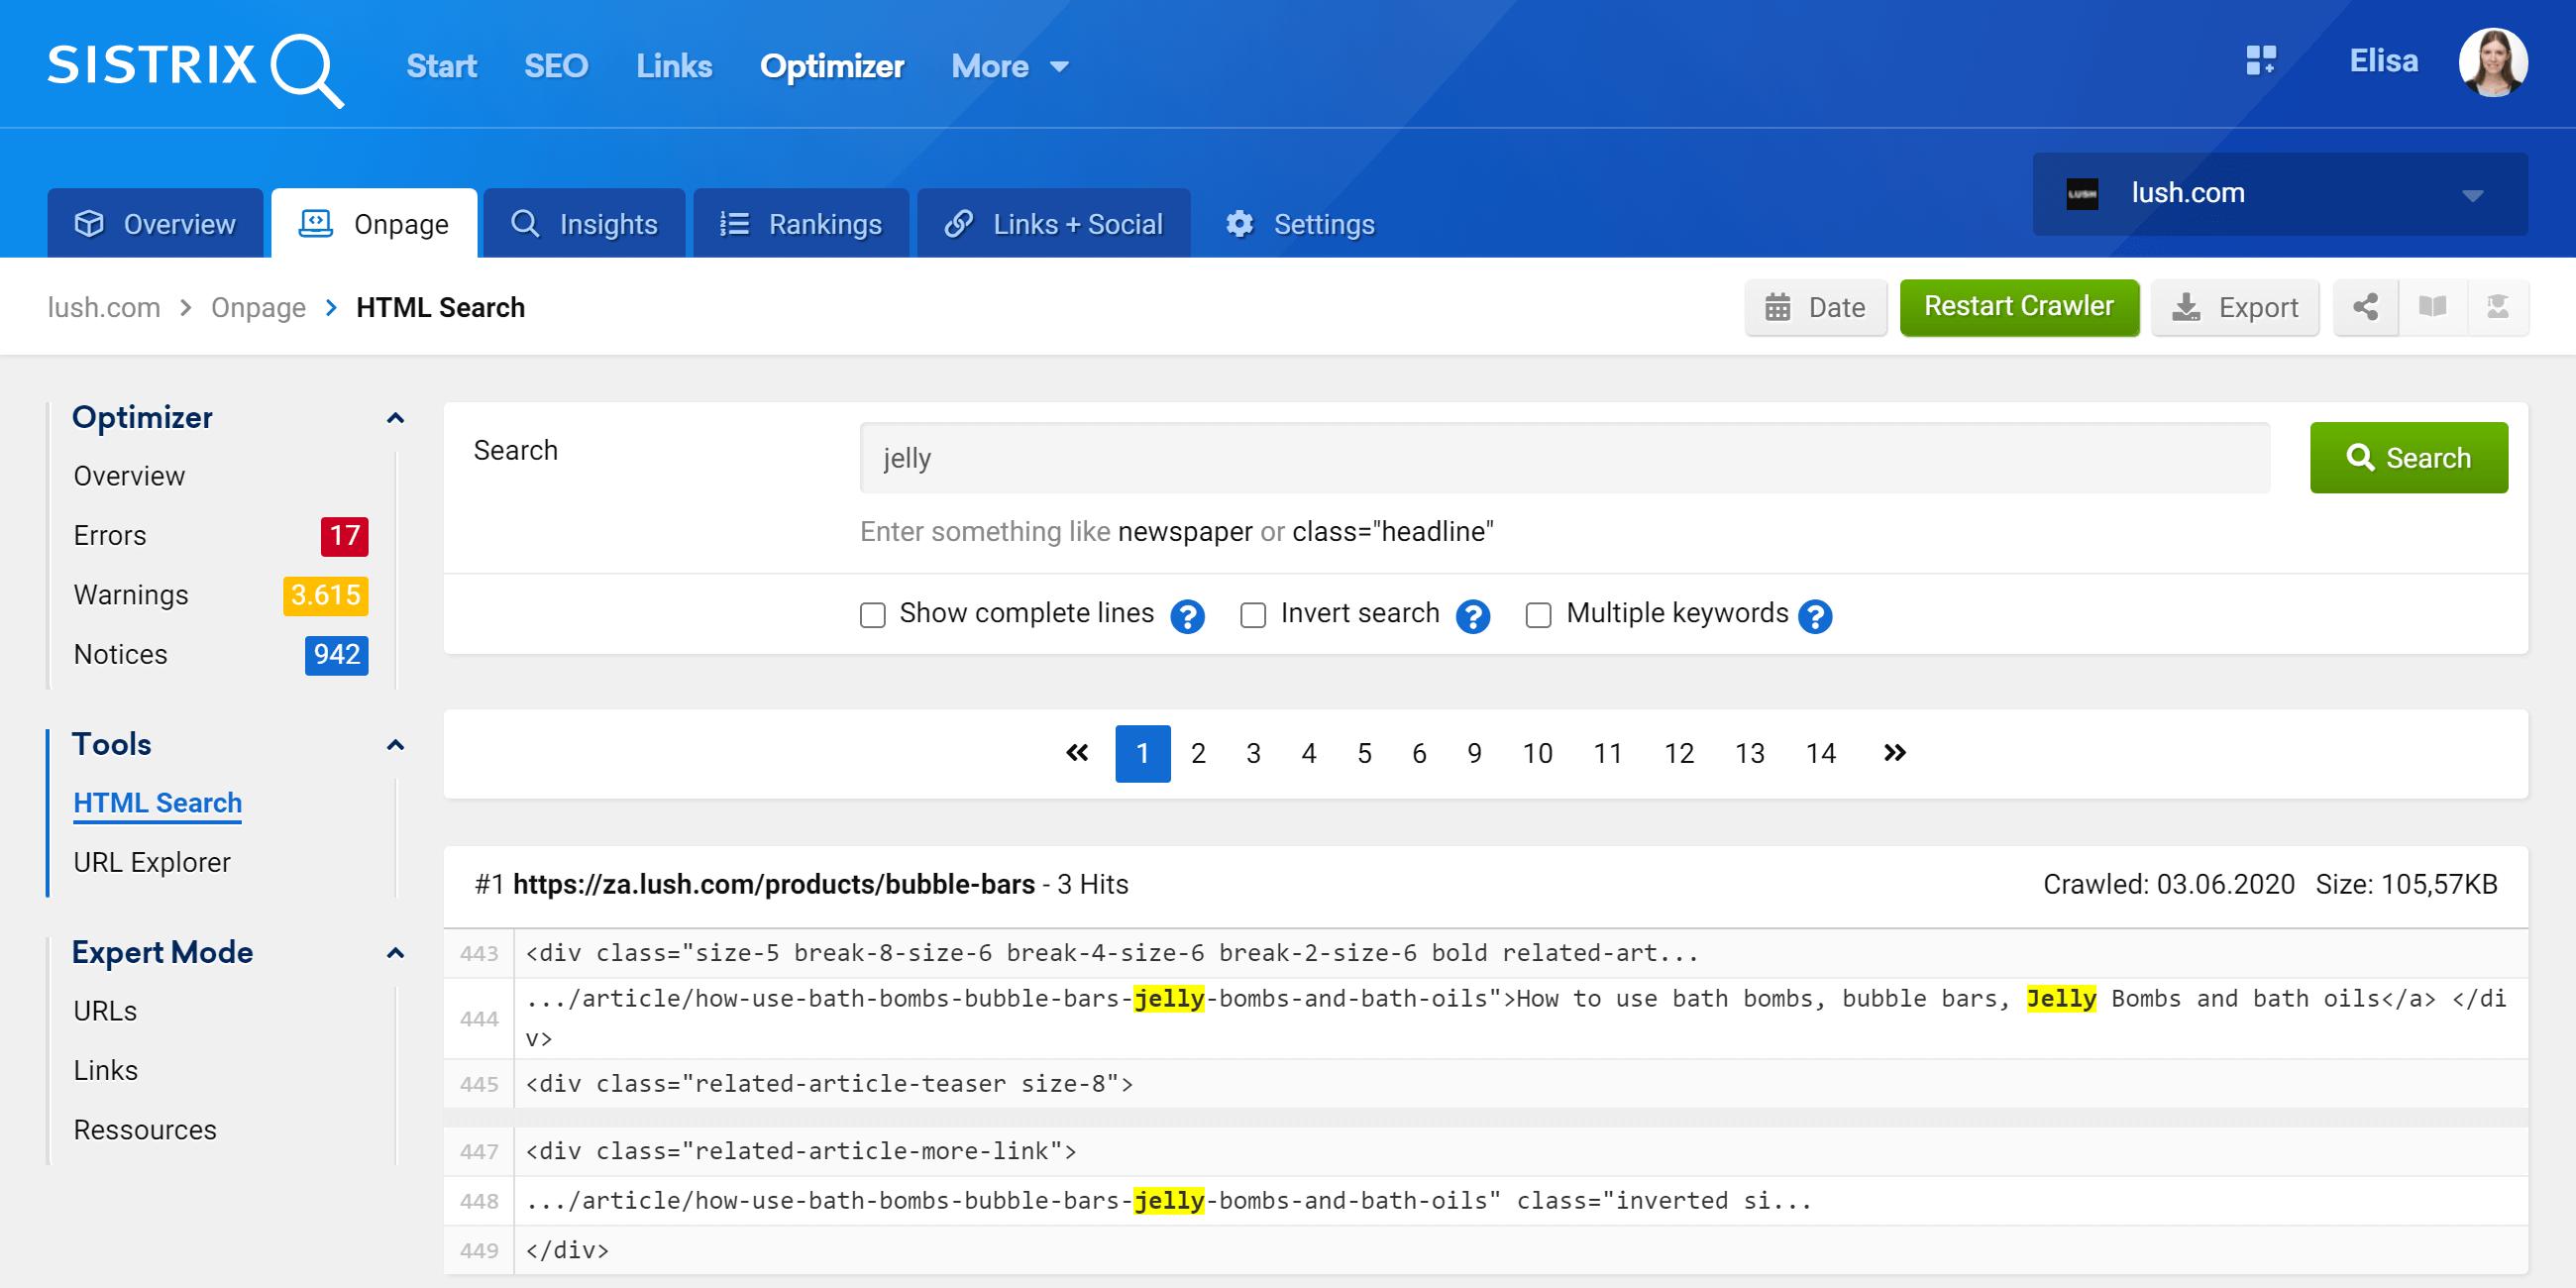 HTML Search in the SISTRIX Optimizer